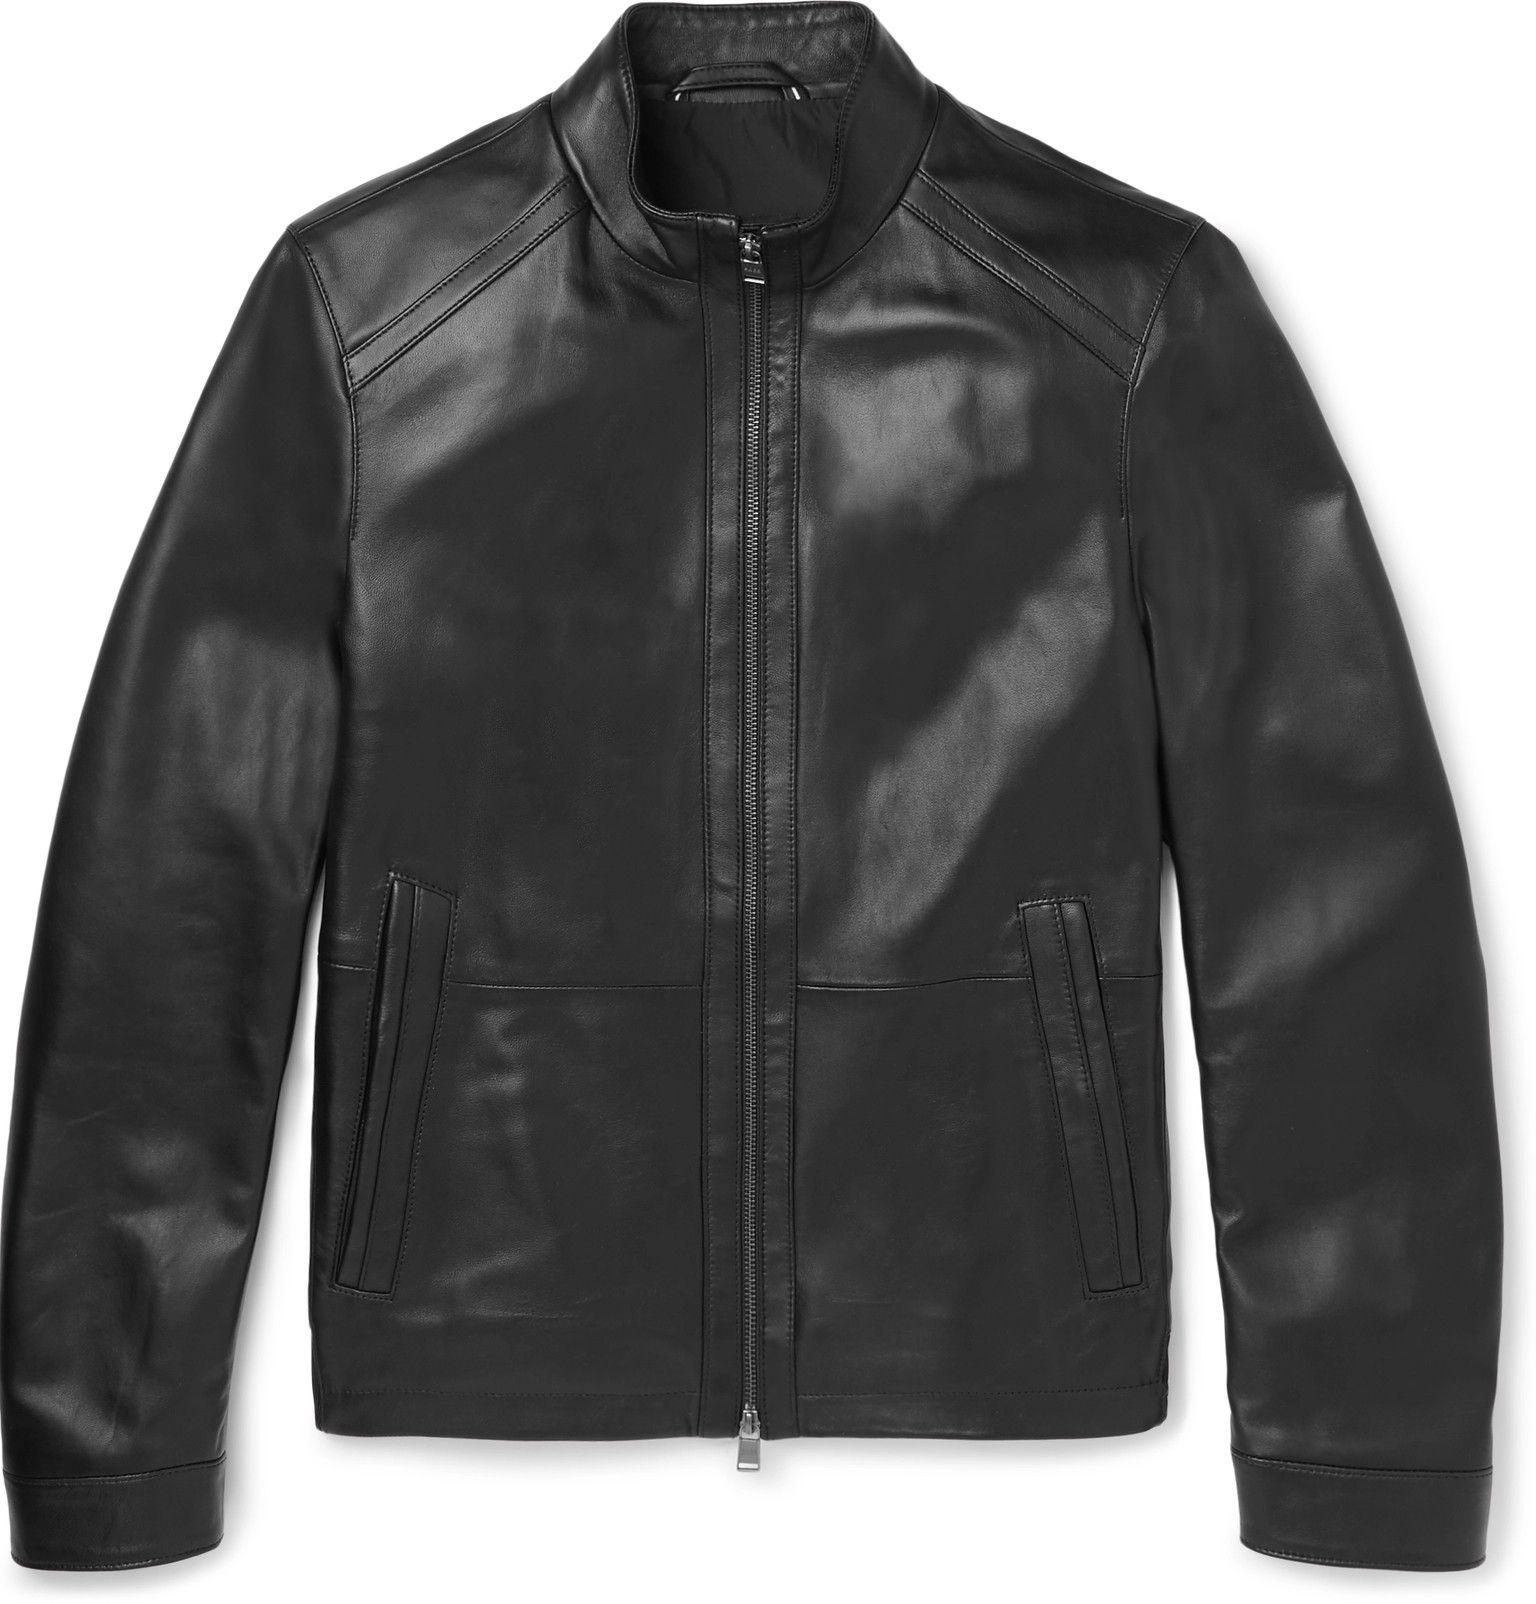 e39980885 Hugo Boss - Nestal Leather Jacket | Evolving my style smartly ...